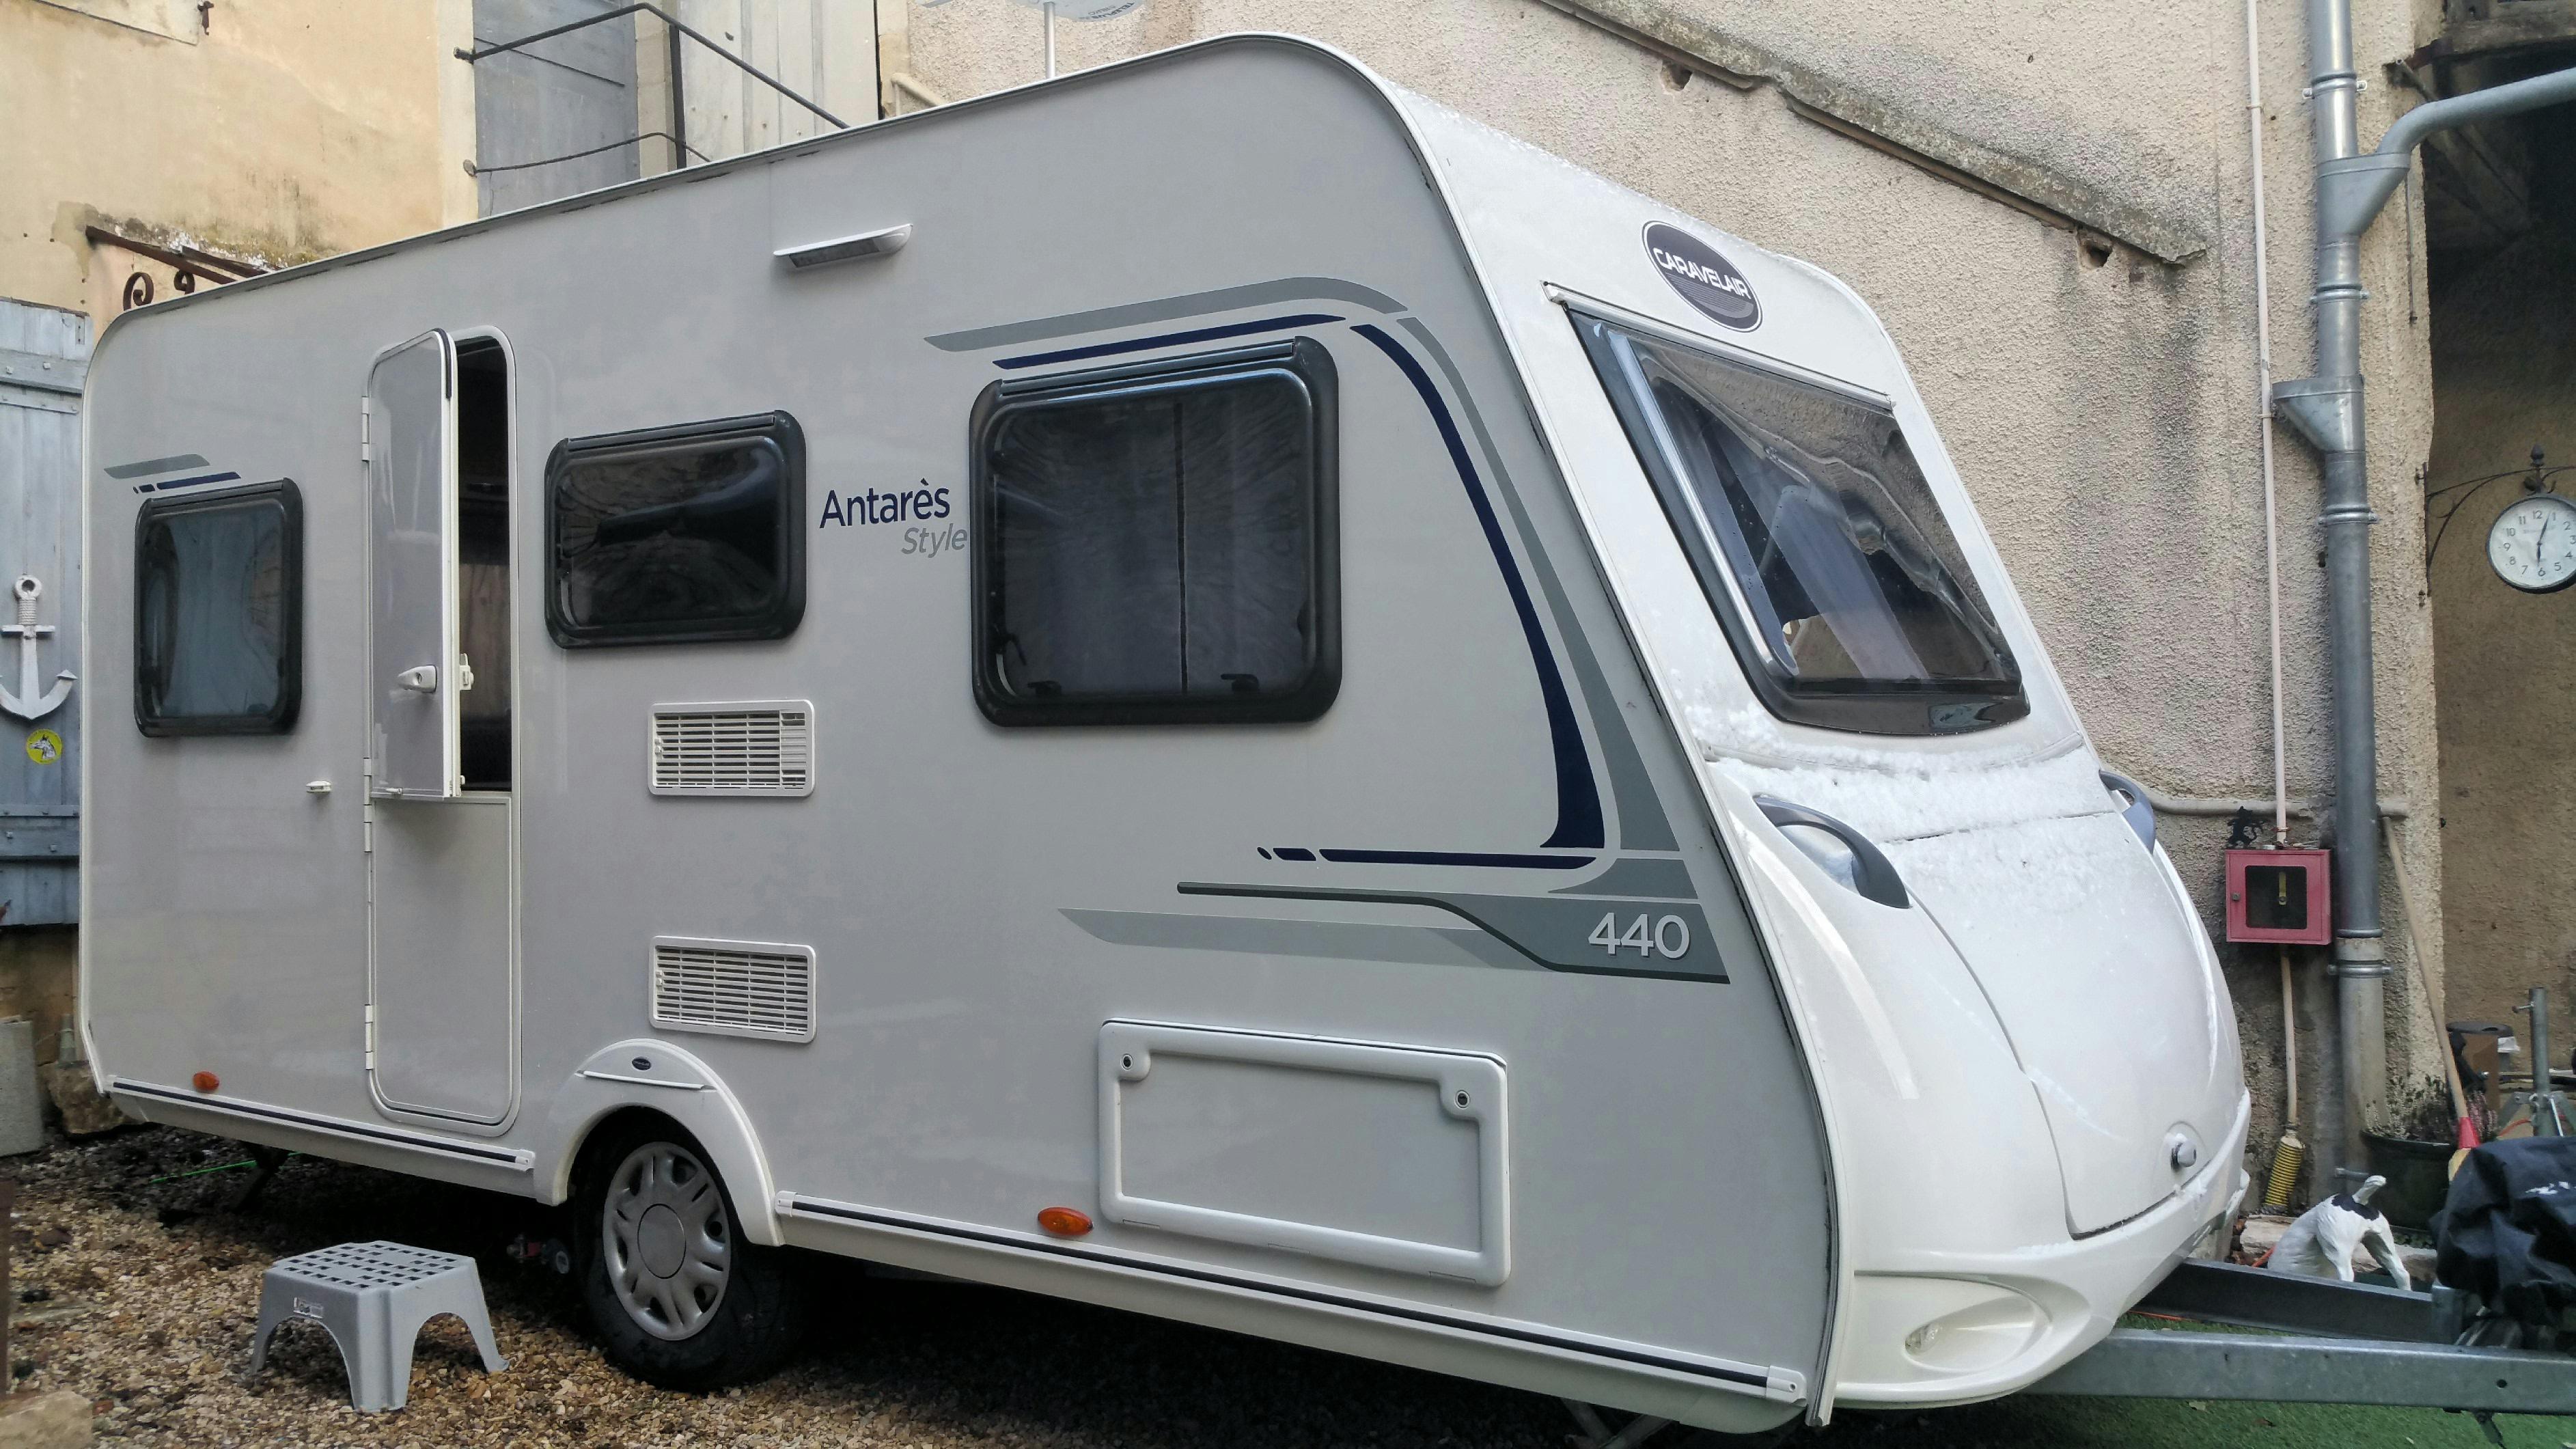 Caravane occasion Caravelair Antares style 440